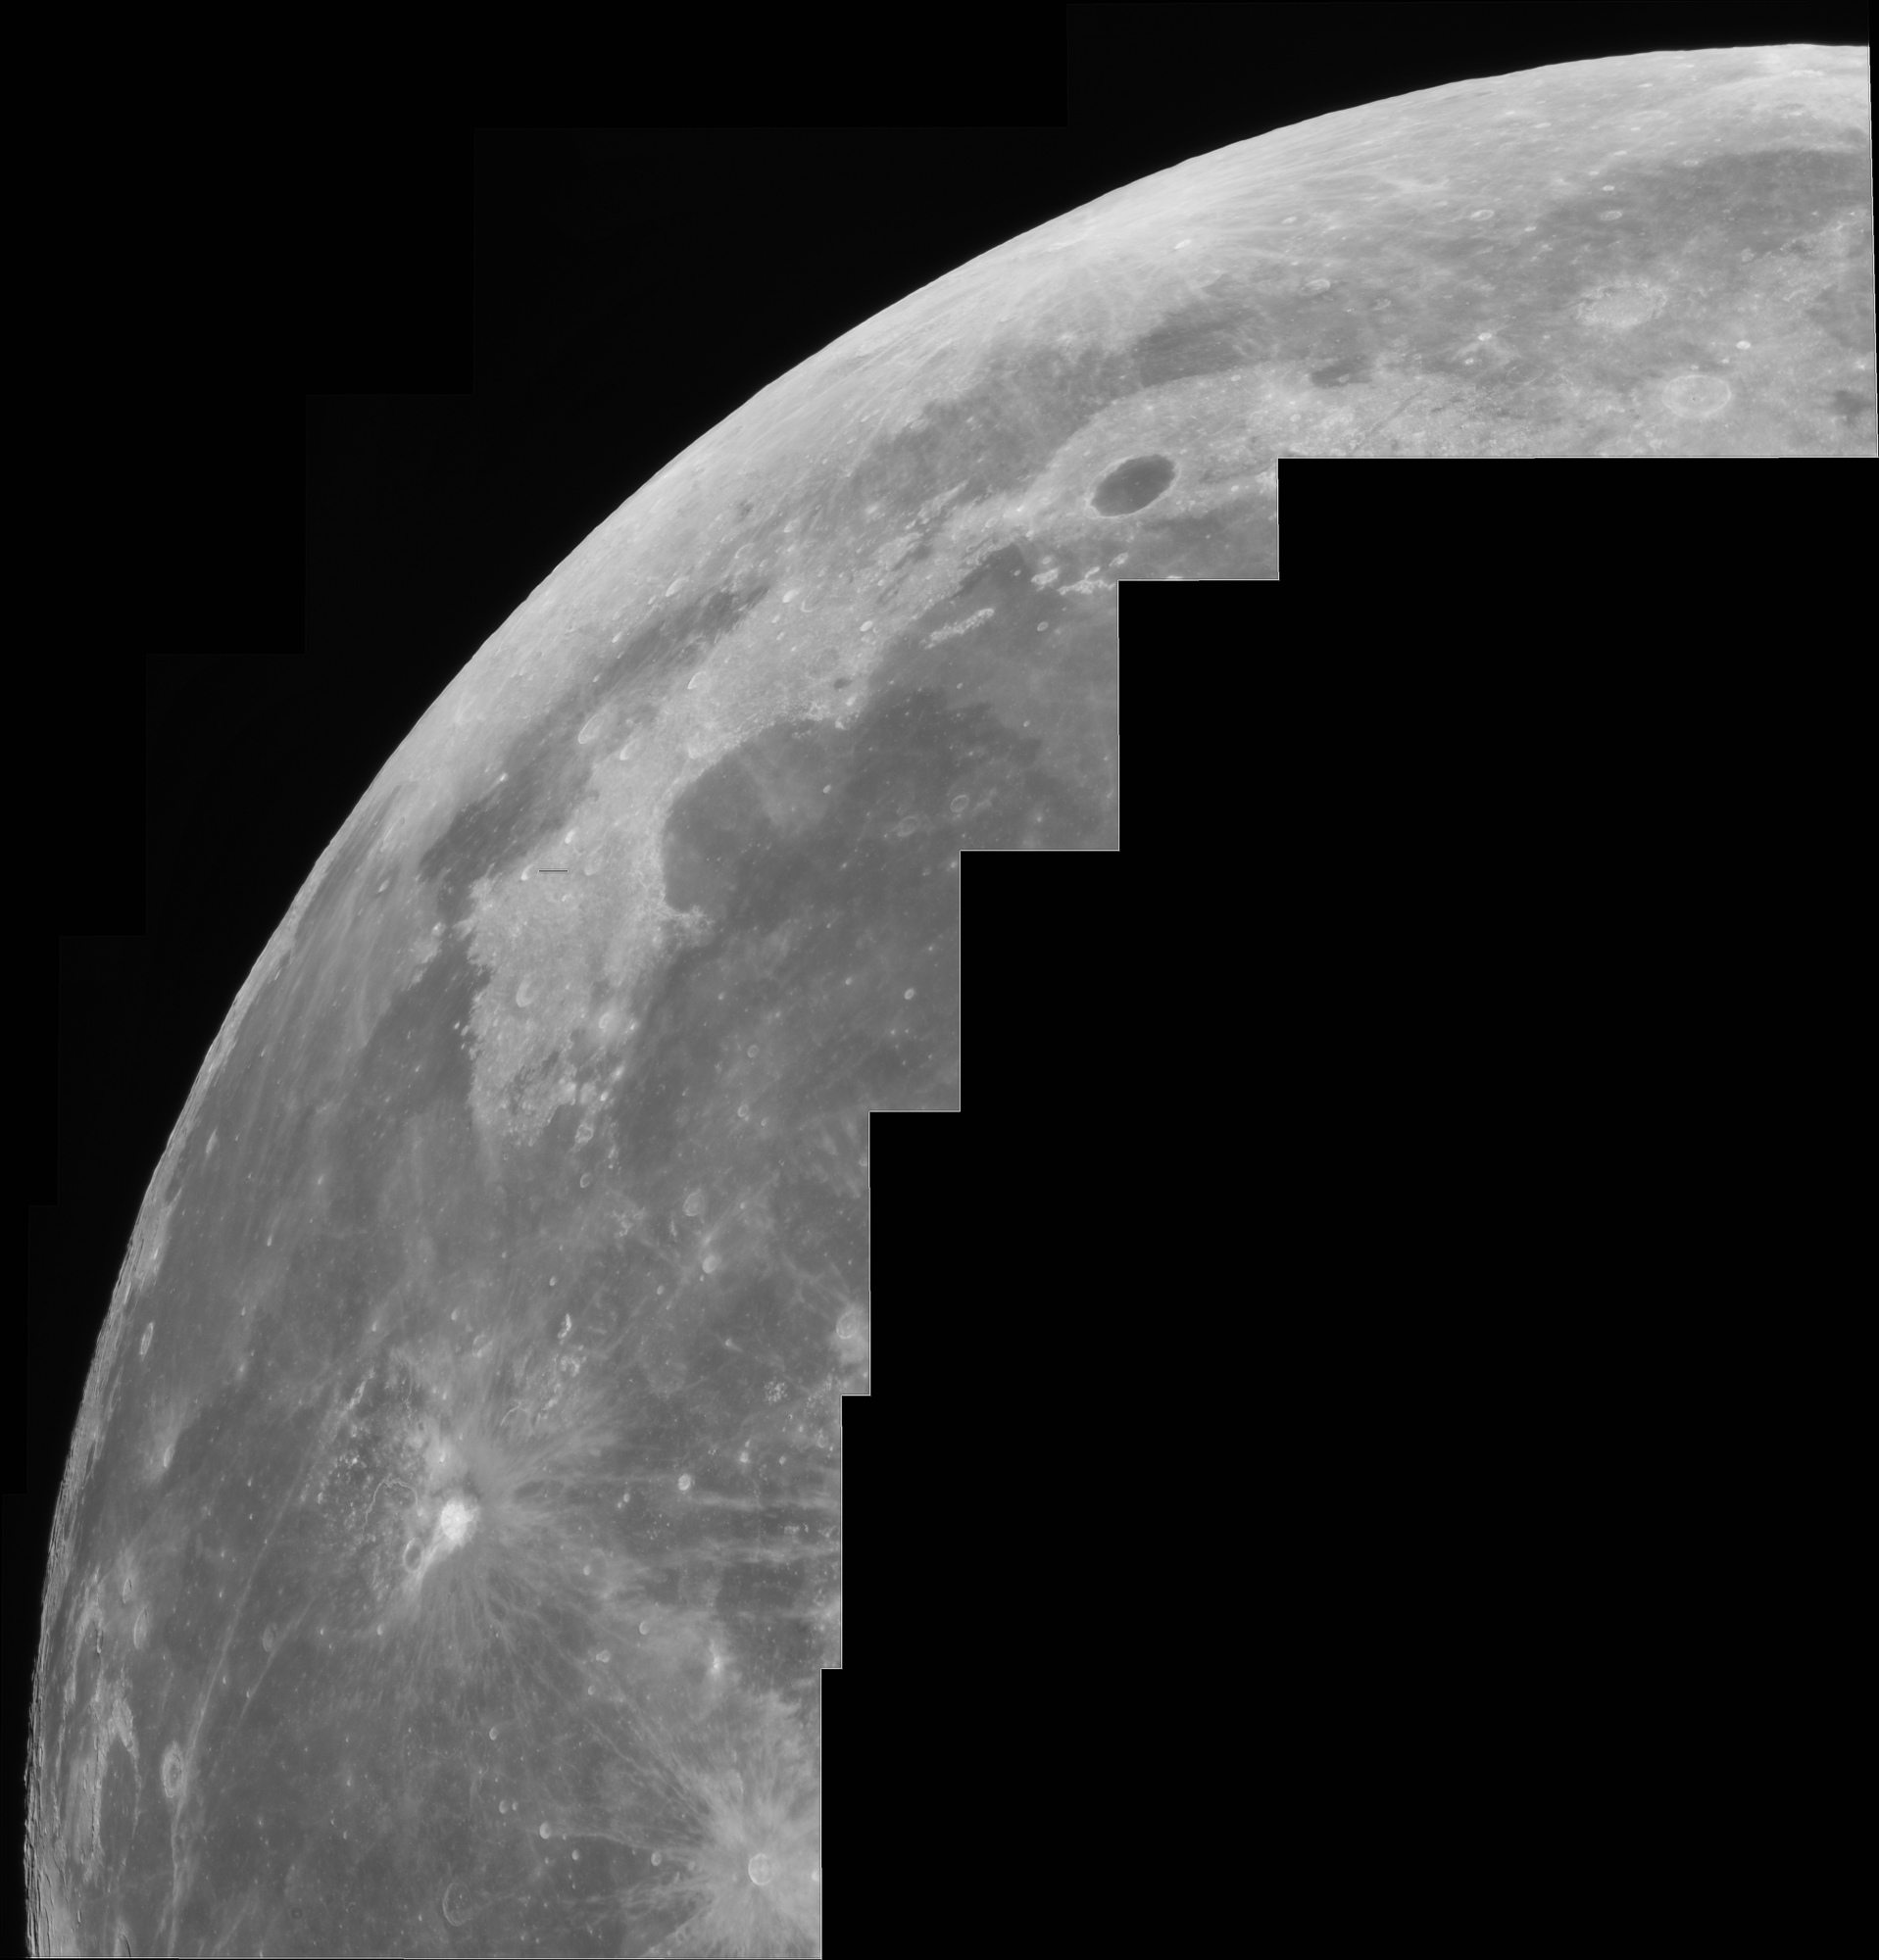 2021-02-26-2127_2-Moon_AS_P25_lapl6_ap2165_stitch.thumb.jpg.48841536ac14bc7db83e616afe85c97c.jpg